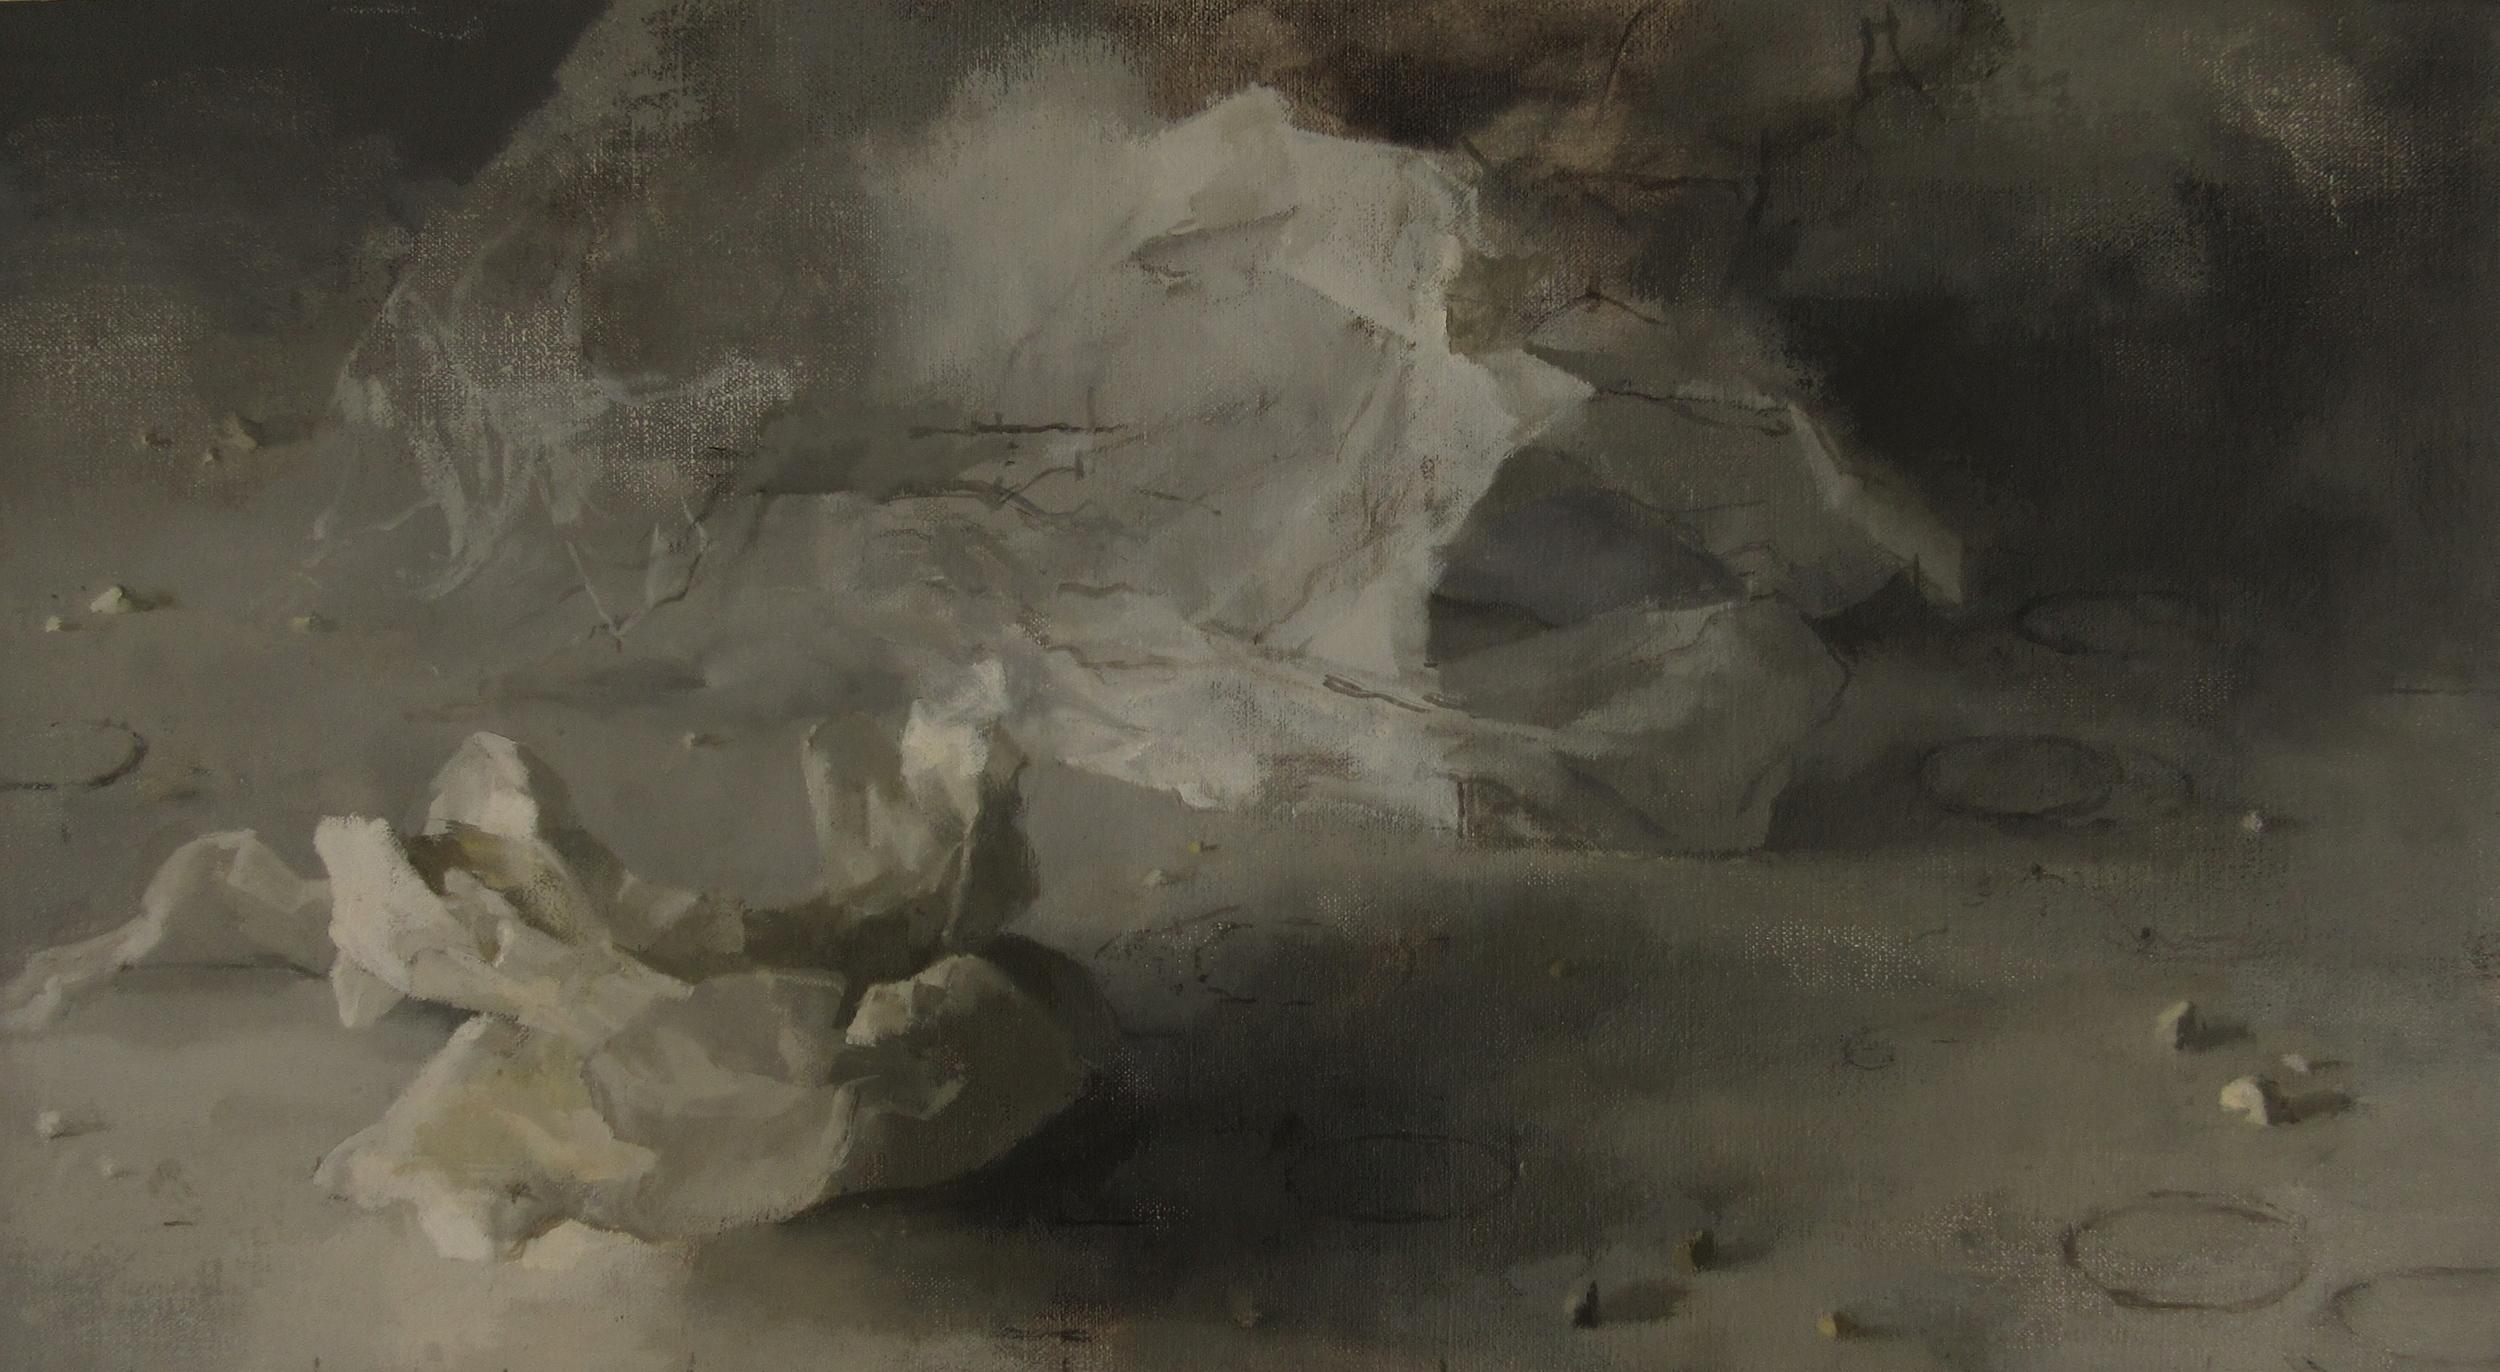 Drift, 2015, oil on canvas laid on board, 57 x 31 cm